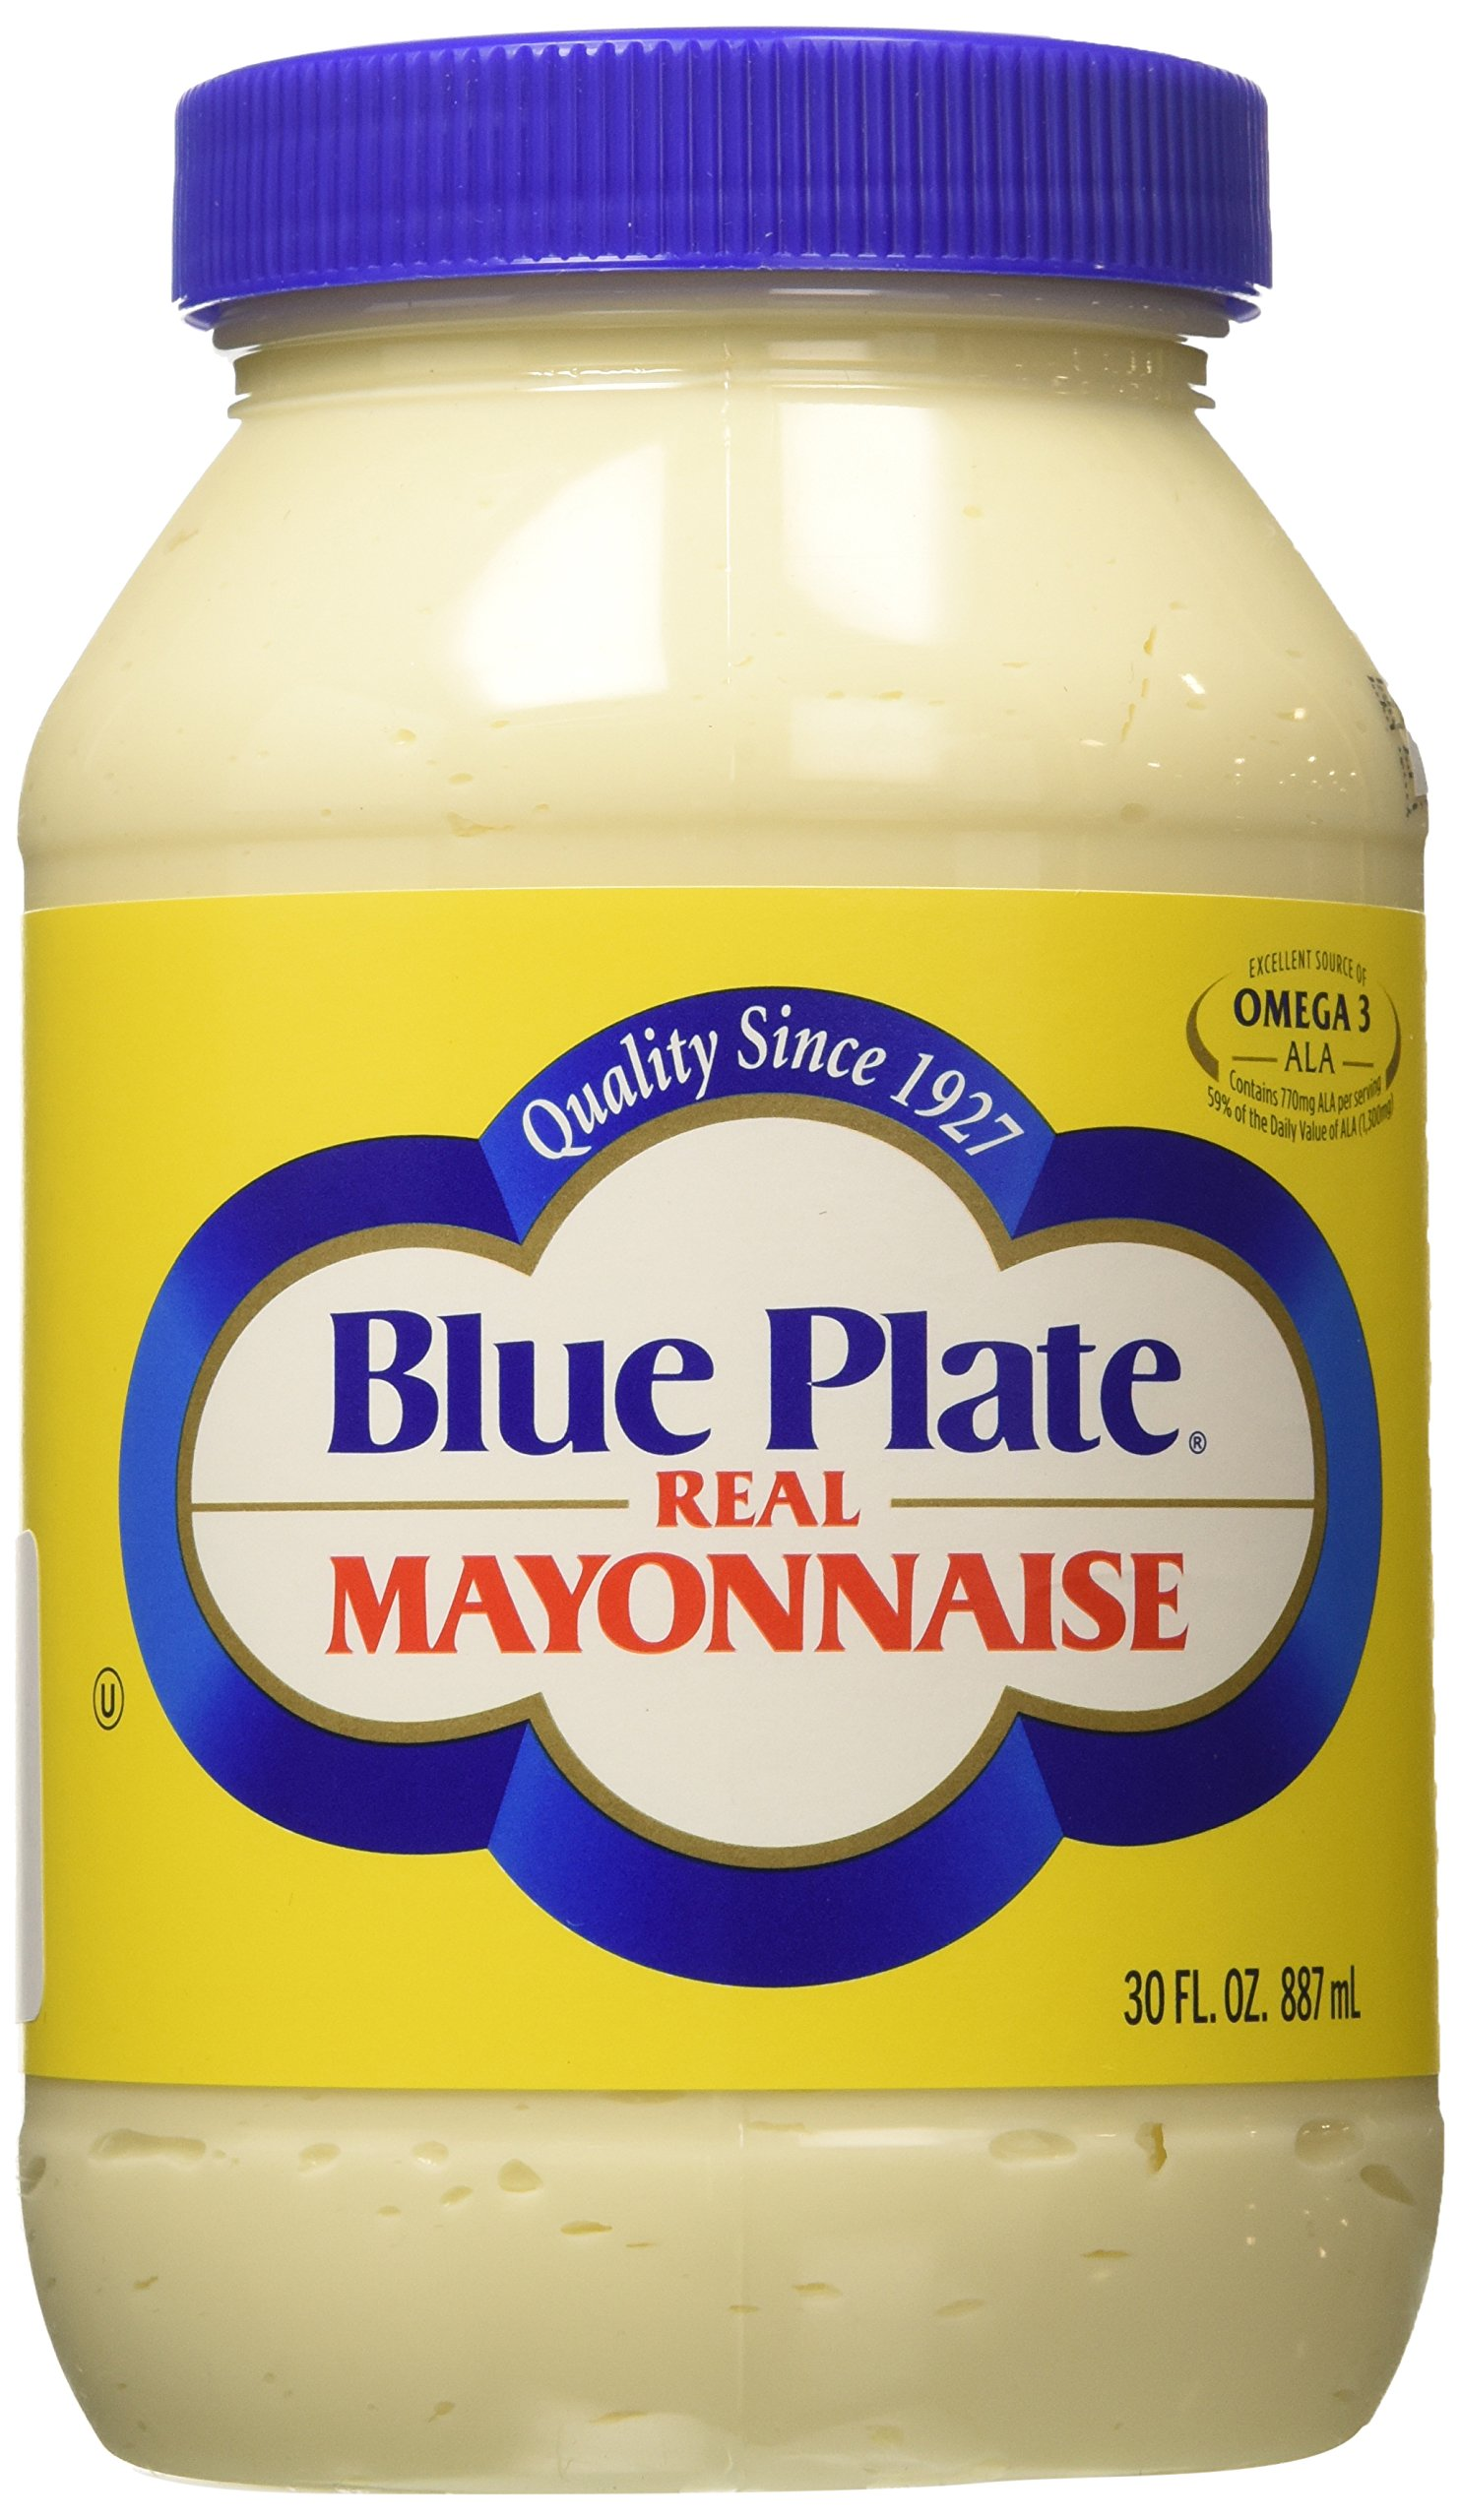 Blue Plate Mayonaise 30 oz. jar (2 pack)